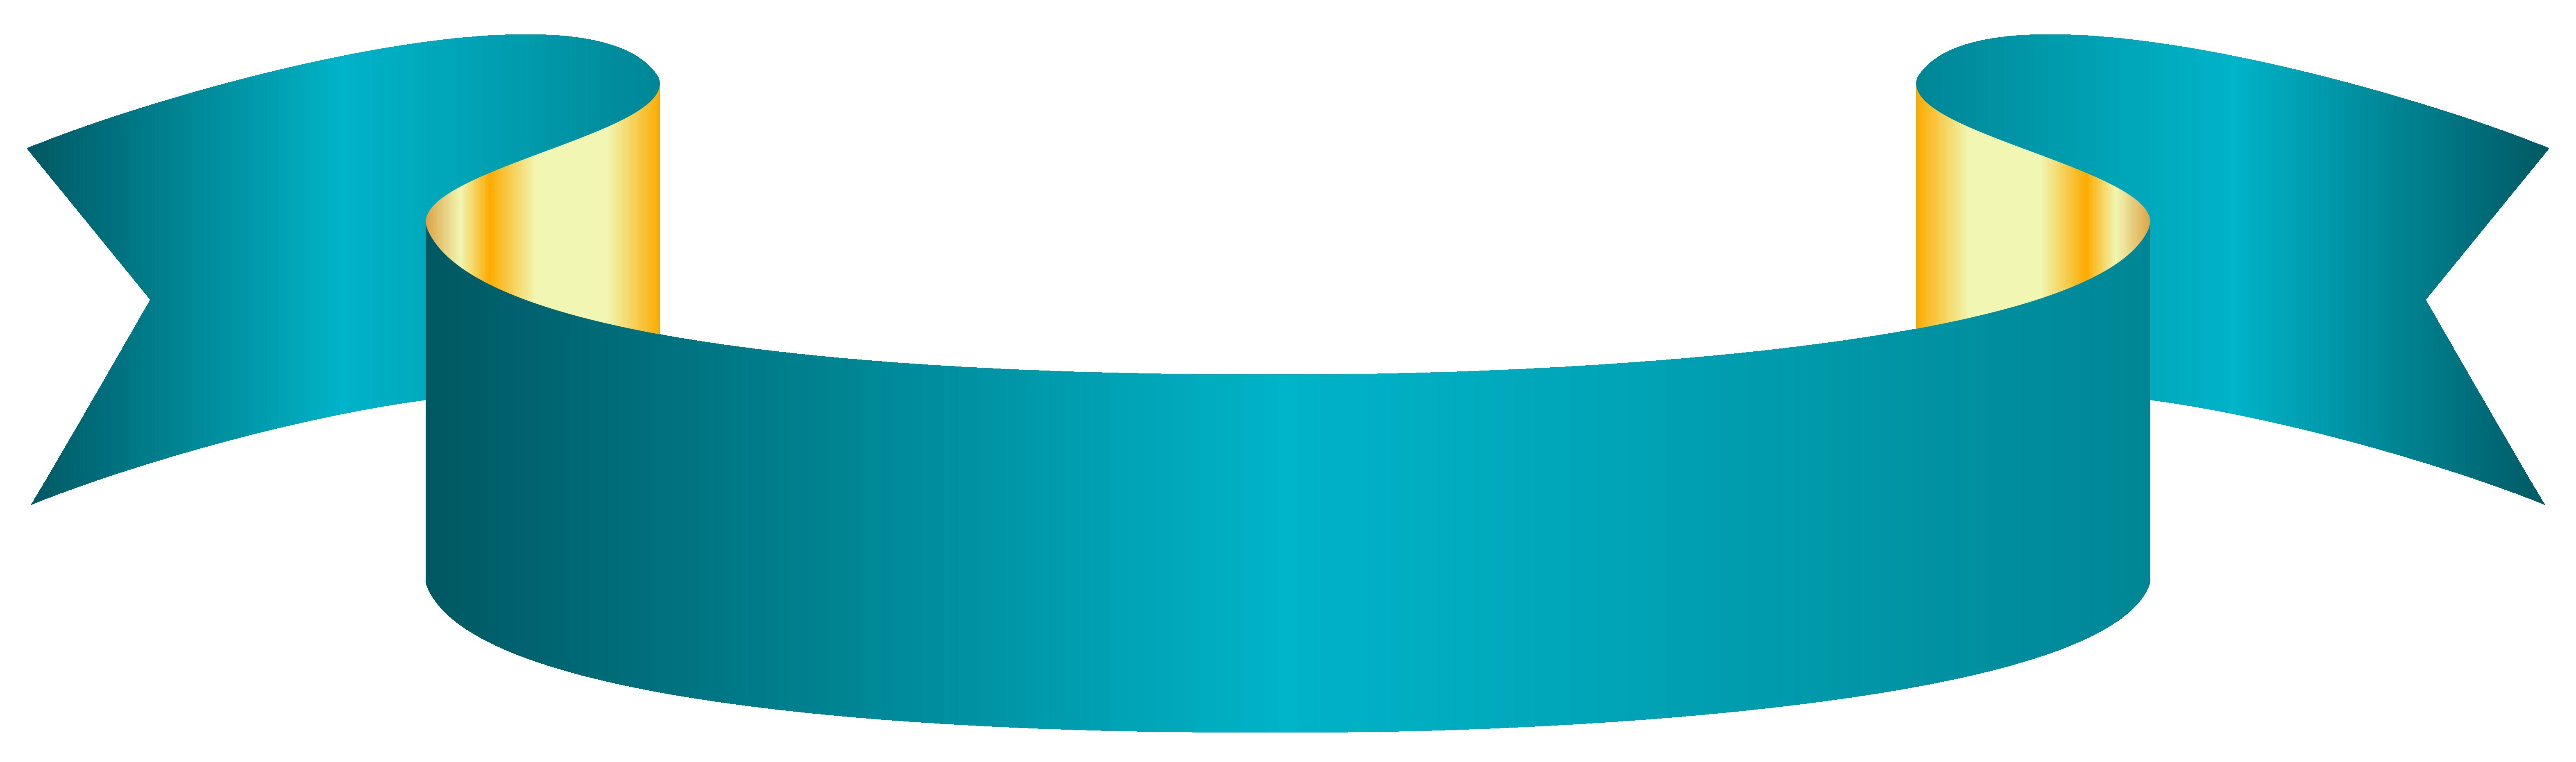 Streamers clipart light blue. Banner transparent png clip